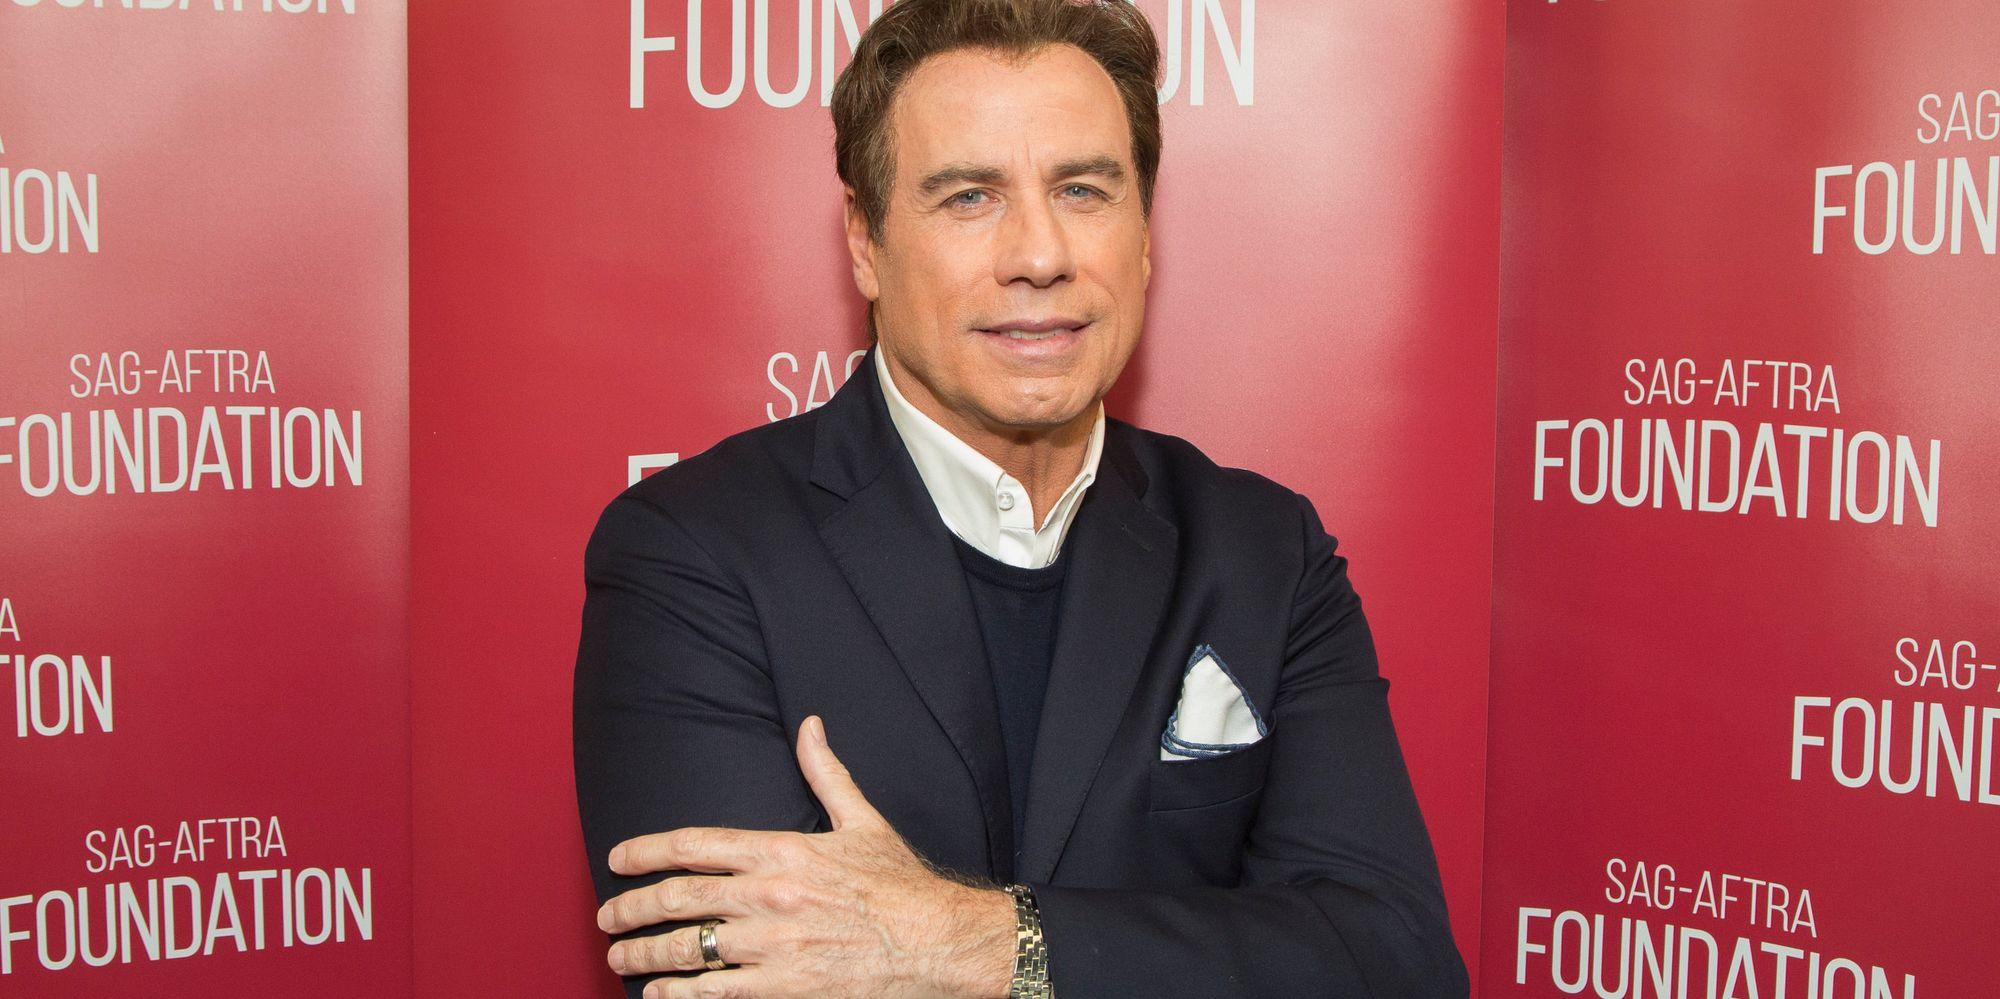 oprah and steven spielberg gave john travolta the go ahead for oprah and steven spielberg gave john travolta the go ahead for american crime story the huffington post